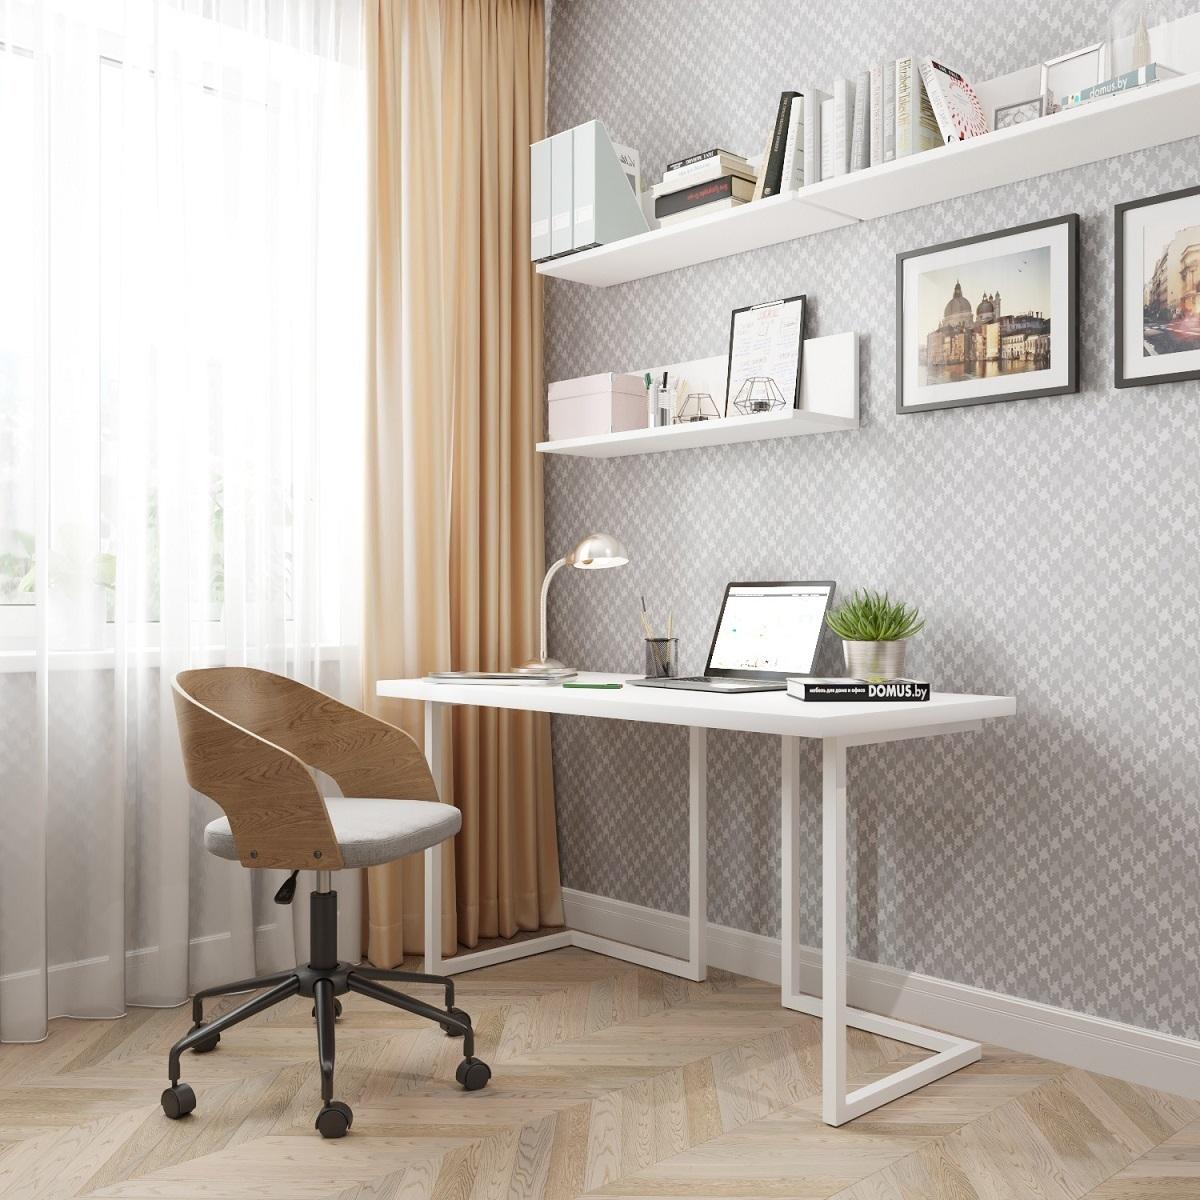 Письменный стол ДОМУС Урбан-1 белый/металл белый